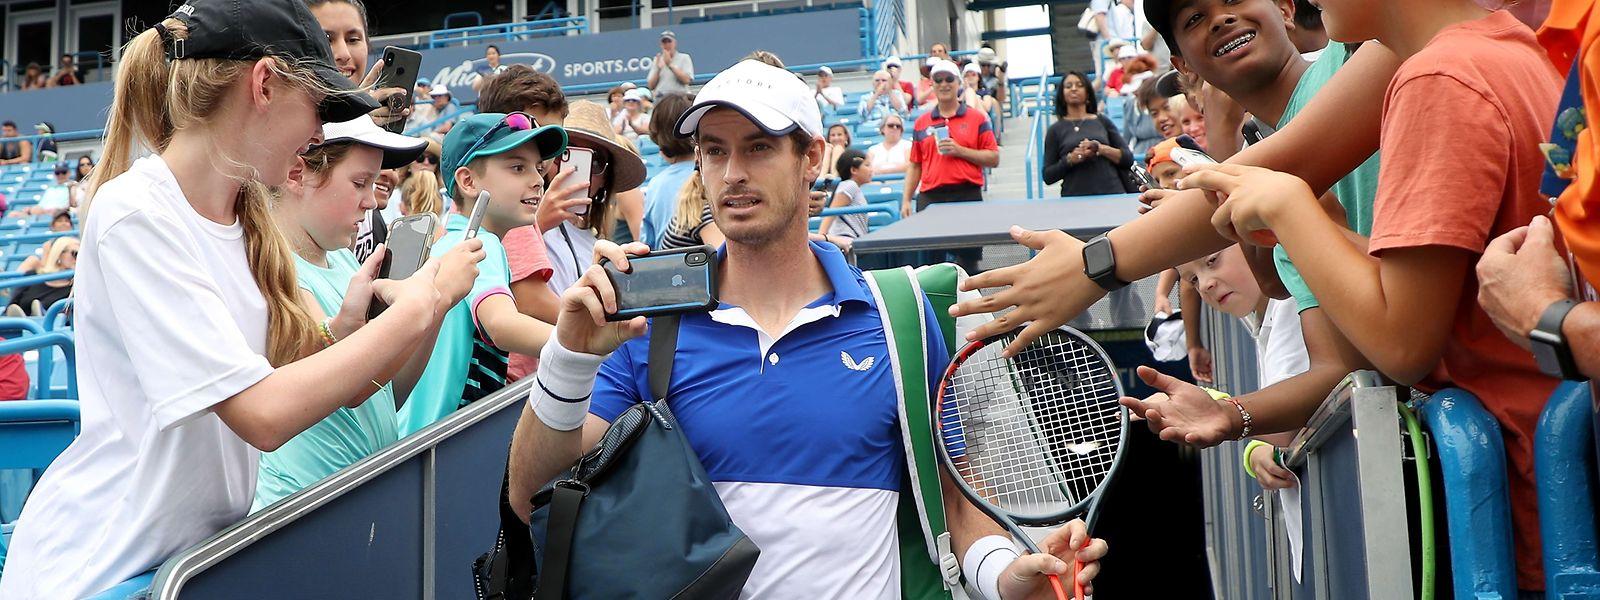 Andy Murray hält den Moment seines Comebacks mit dem Smartphone fest.